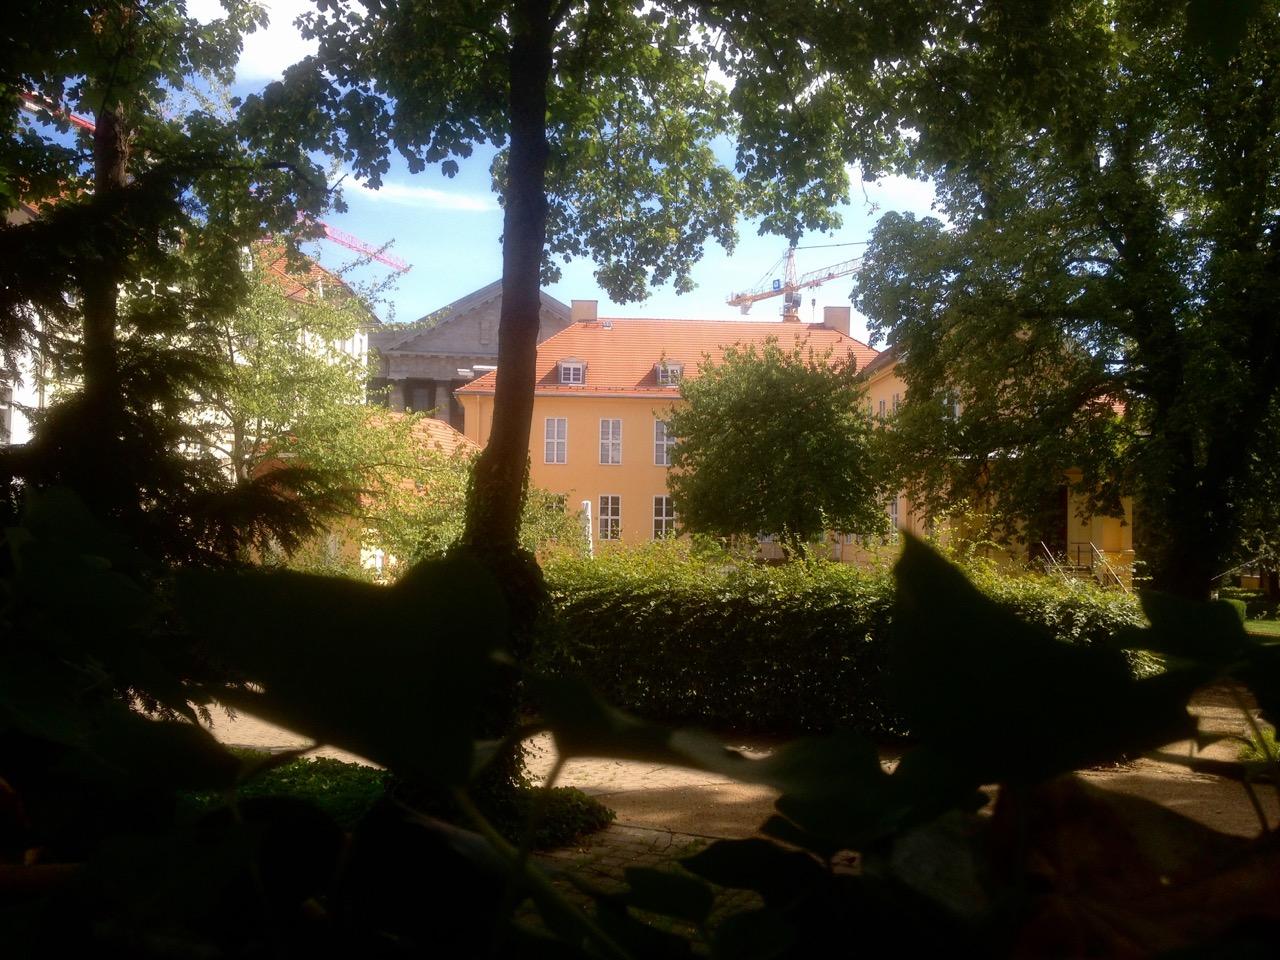 Barocker Stadtgarten - es gibt ja sonst keine Bauflächen in Berlin (Foto: André Franke)